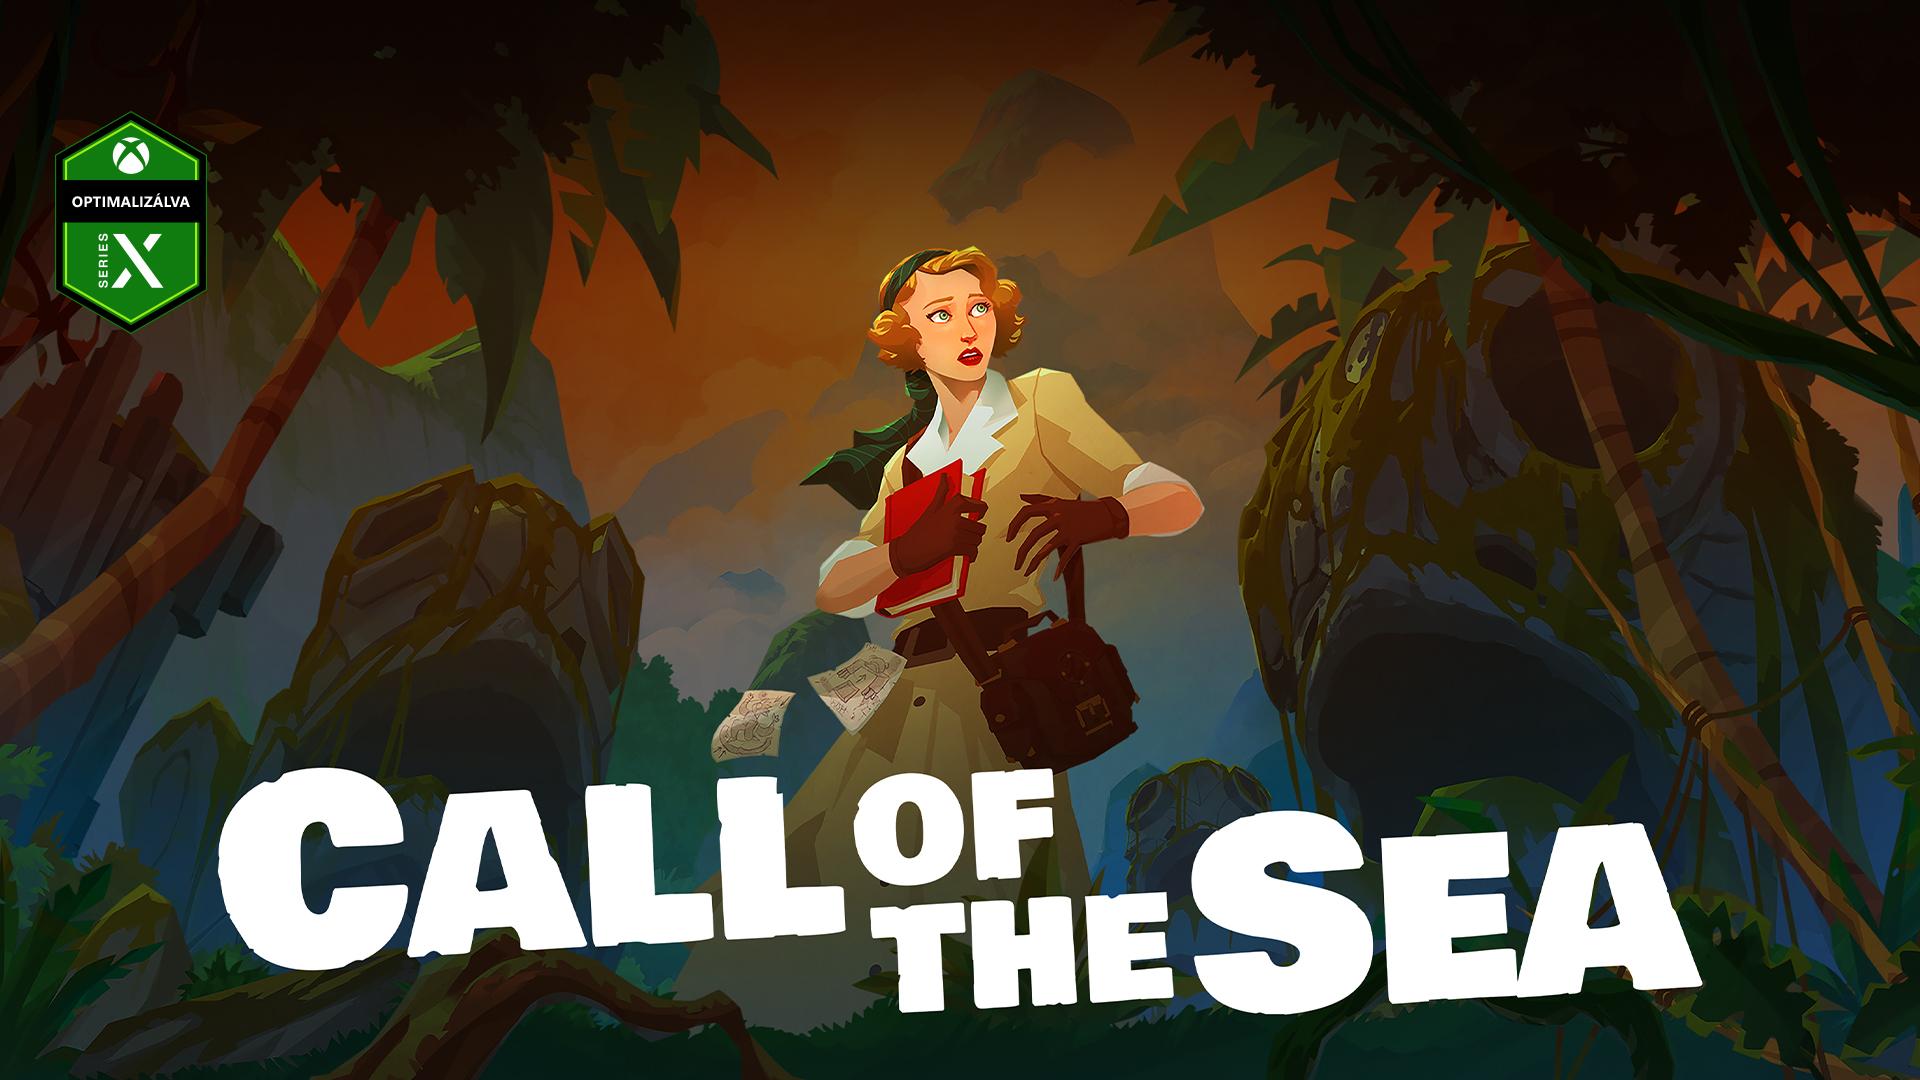 A Series X konzolra optimalizálva – logó, Call of the Sea, Norah egy dzsungelben